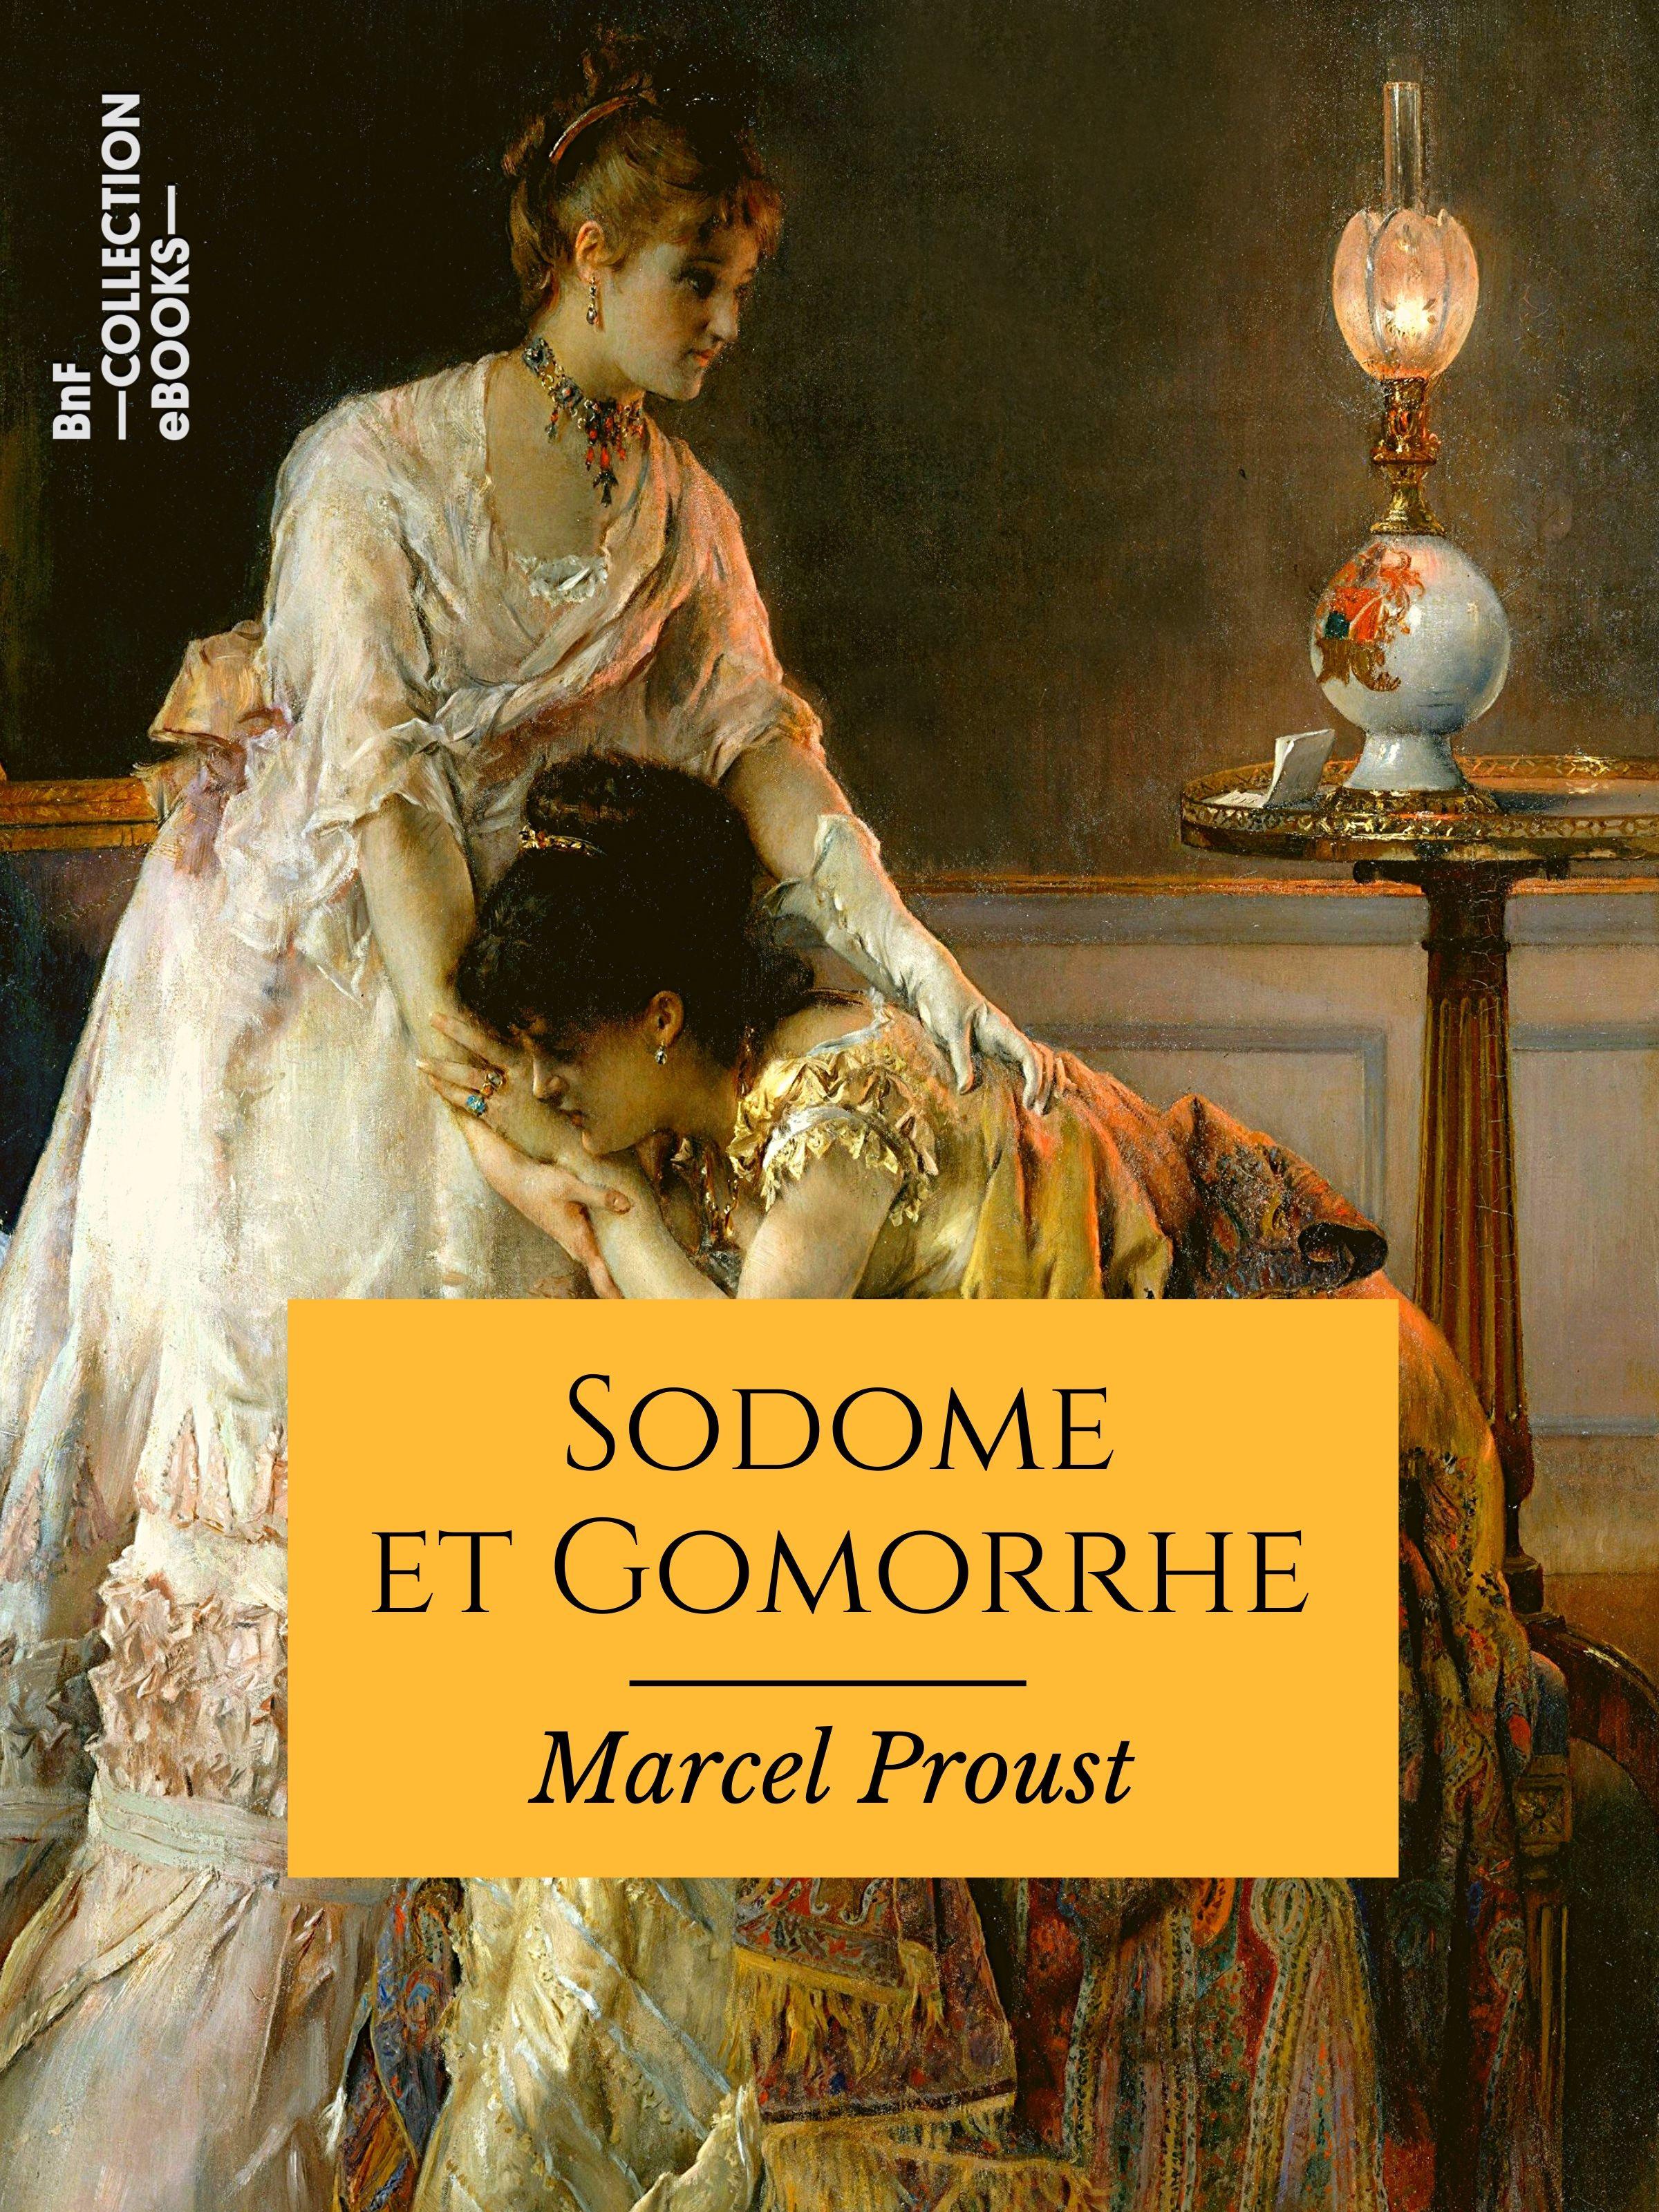 Vignette du livre Sodome et Gomorrhe - Marcel Proust